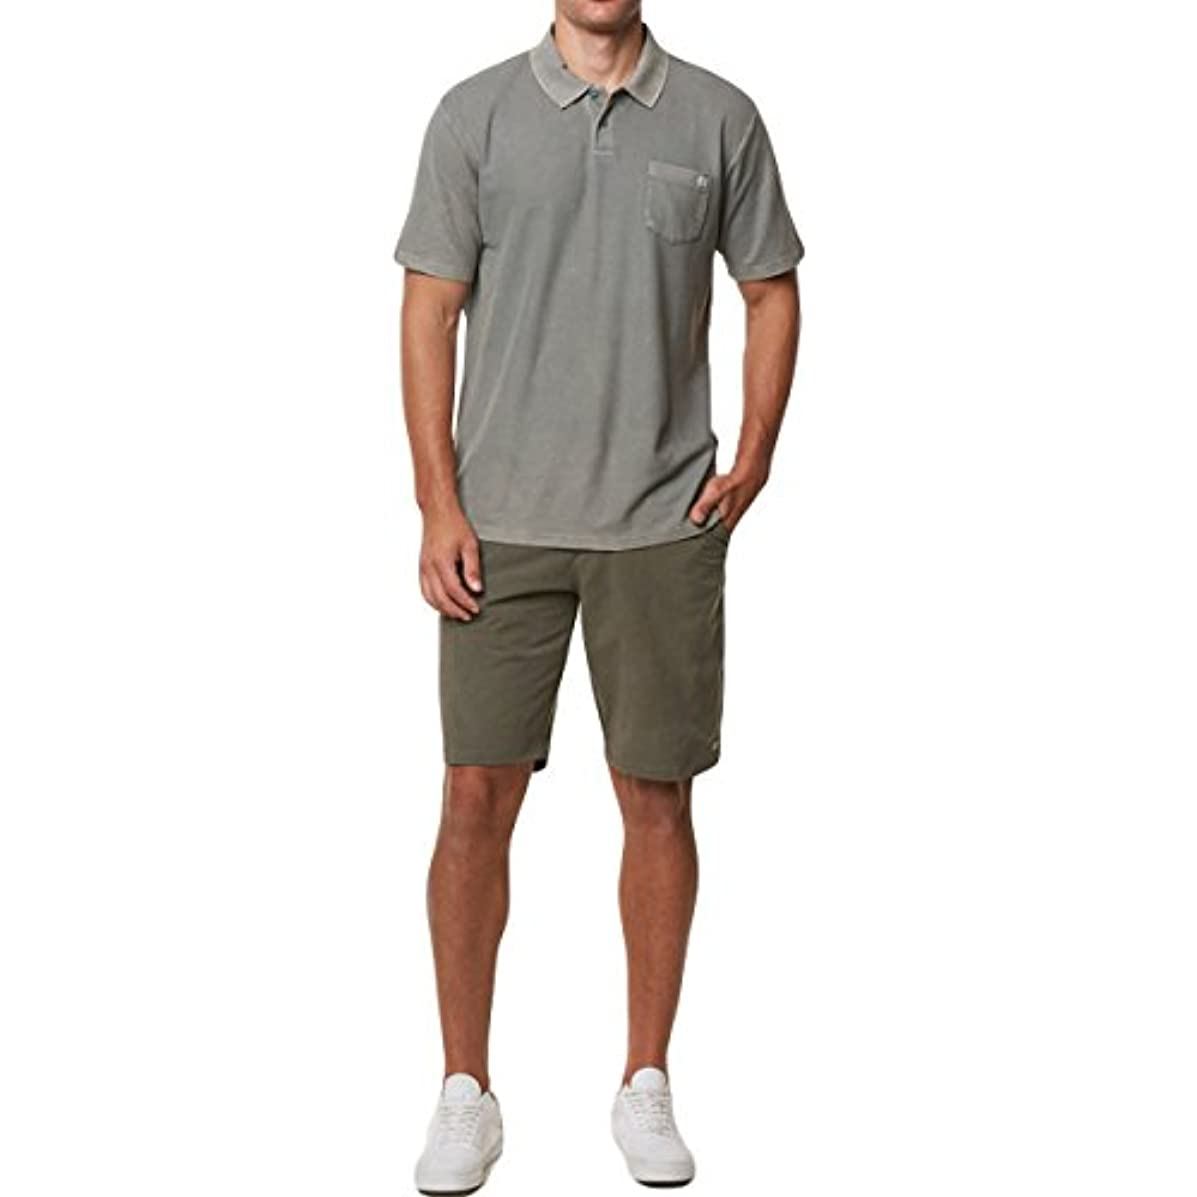 O'Neill Men's Jack Shoreline Short-Sleeve Shirts